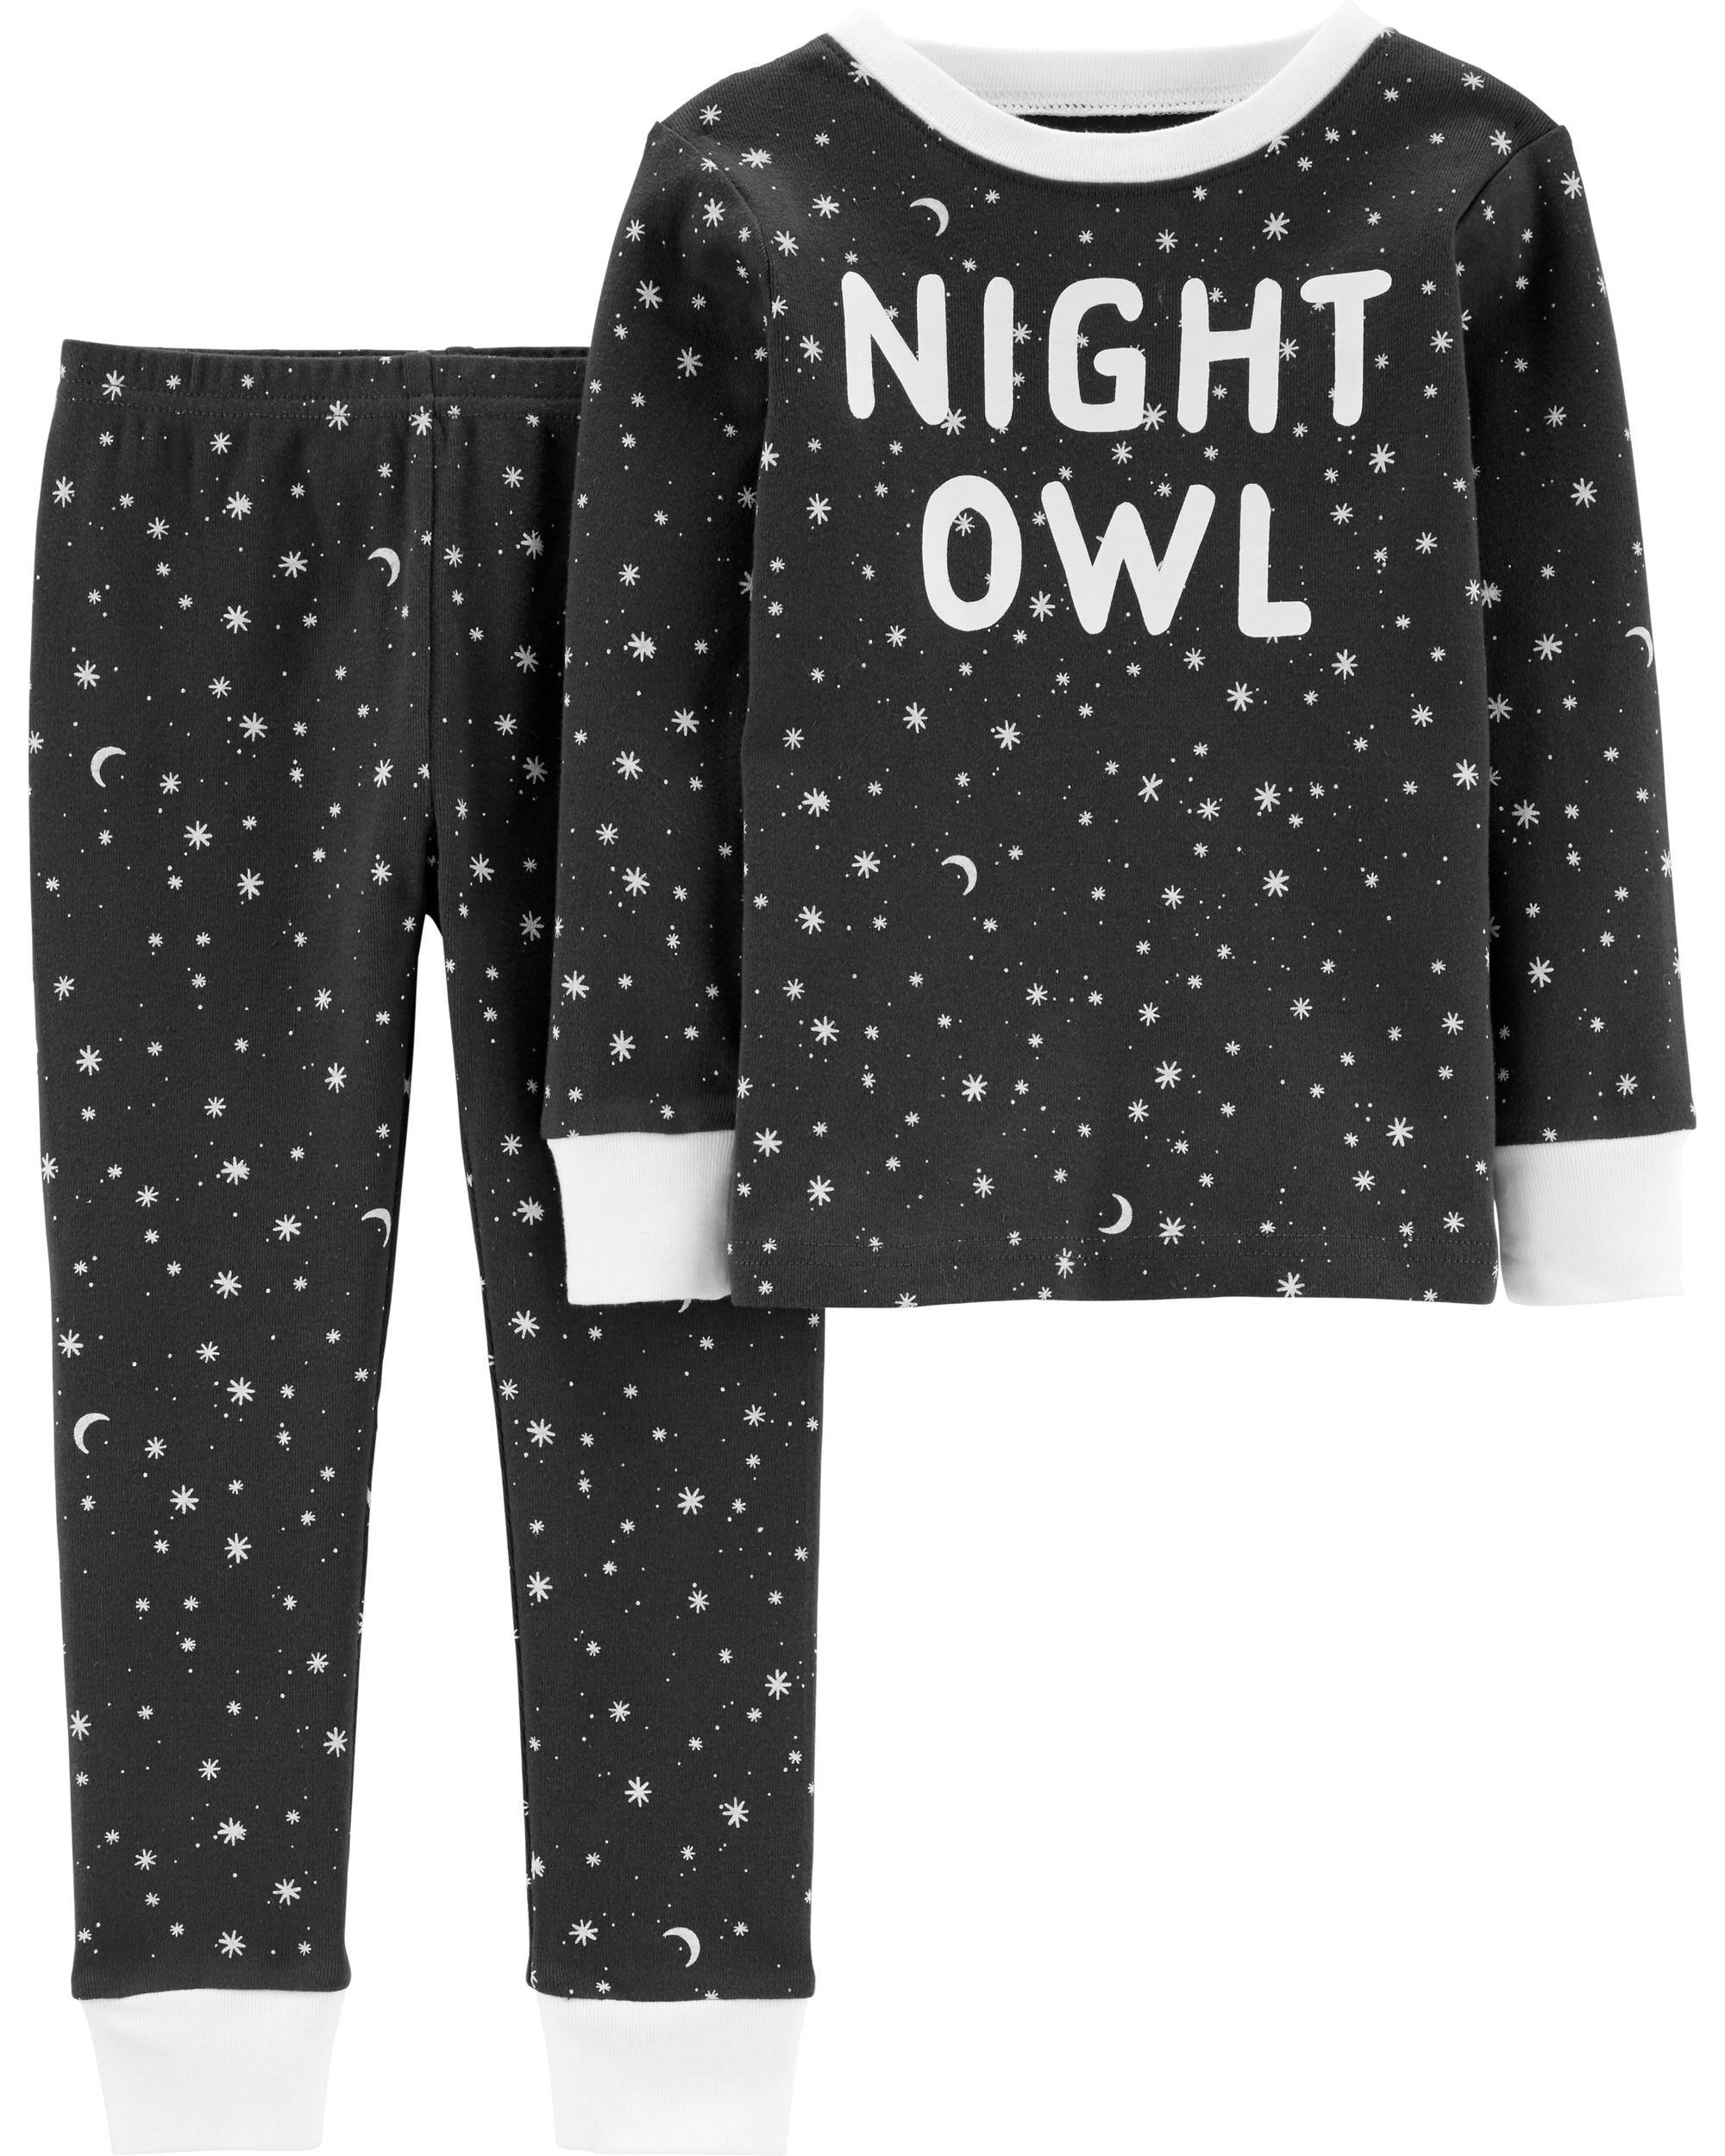 Toddler Baby Boys Bodysuit Short-Sleeve Onesie Hot Air Balloon Print Rompers Summer Pajamas